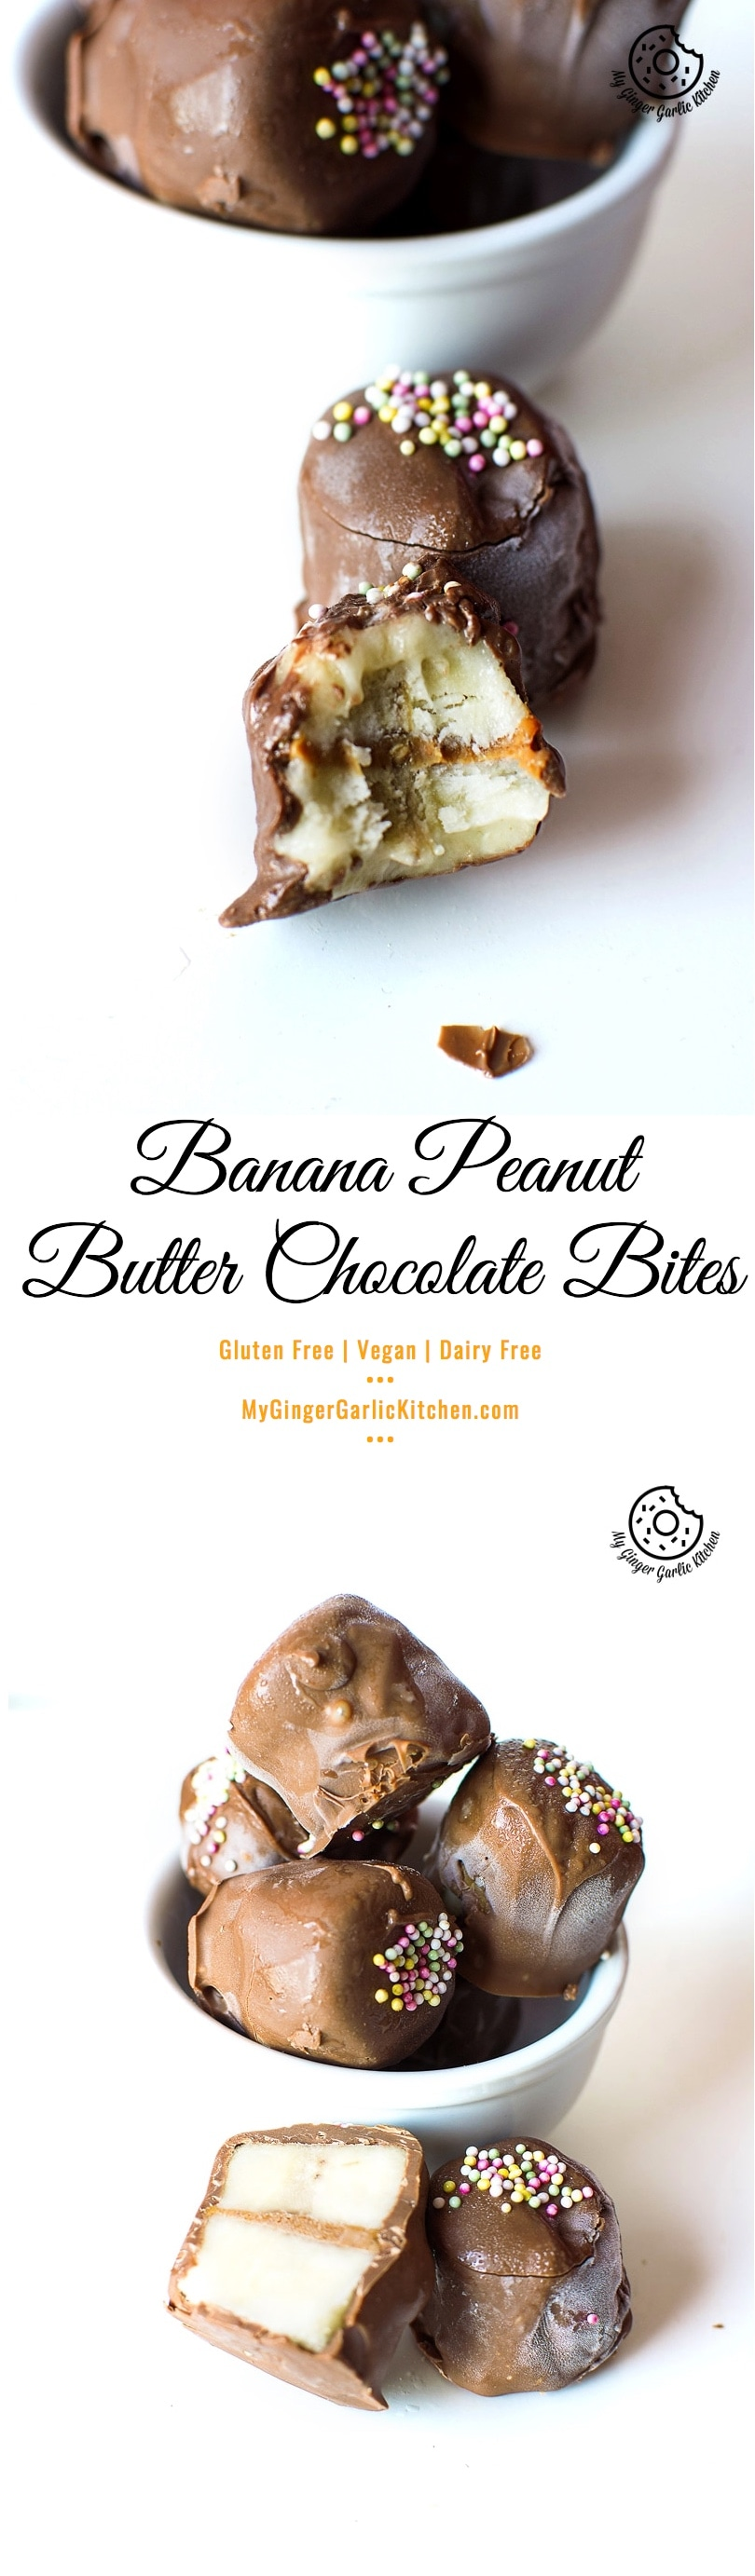 Banana Peanut Butter Chocolate Bites | Yogurt Kebab | Dahi Kebab | mygingergarlickitchen.com/ @anupama_dreams